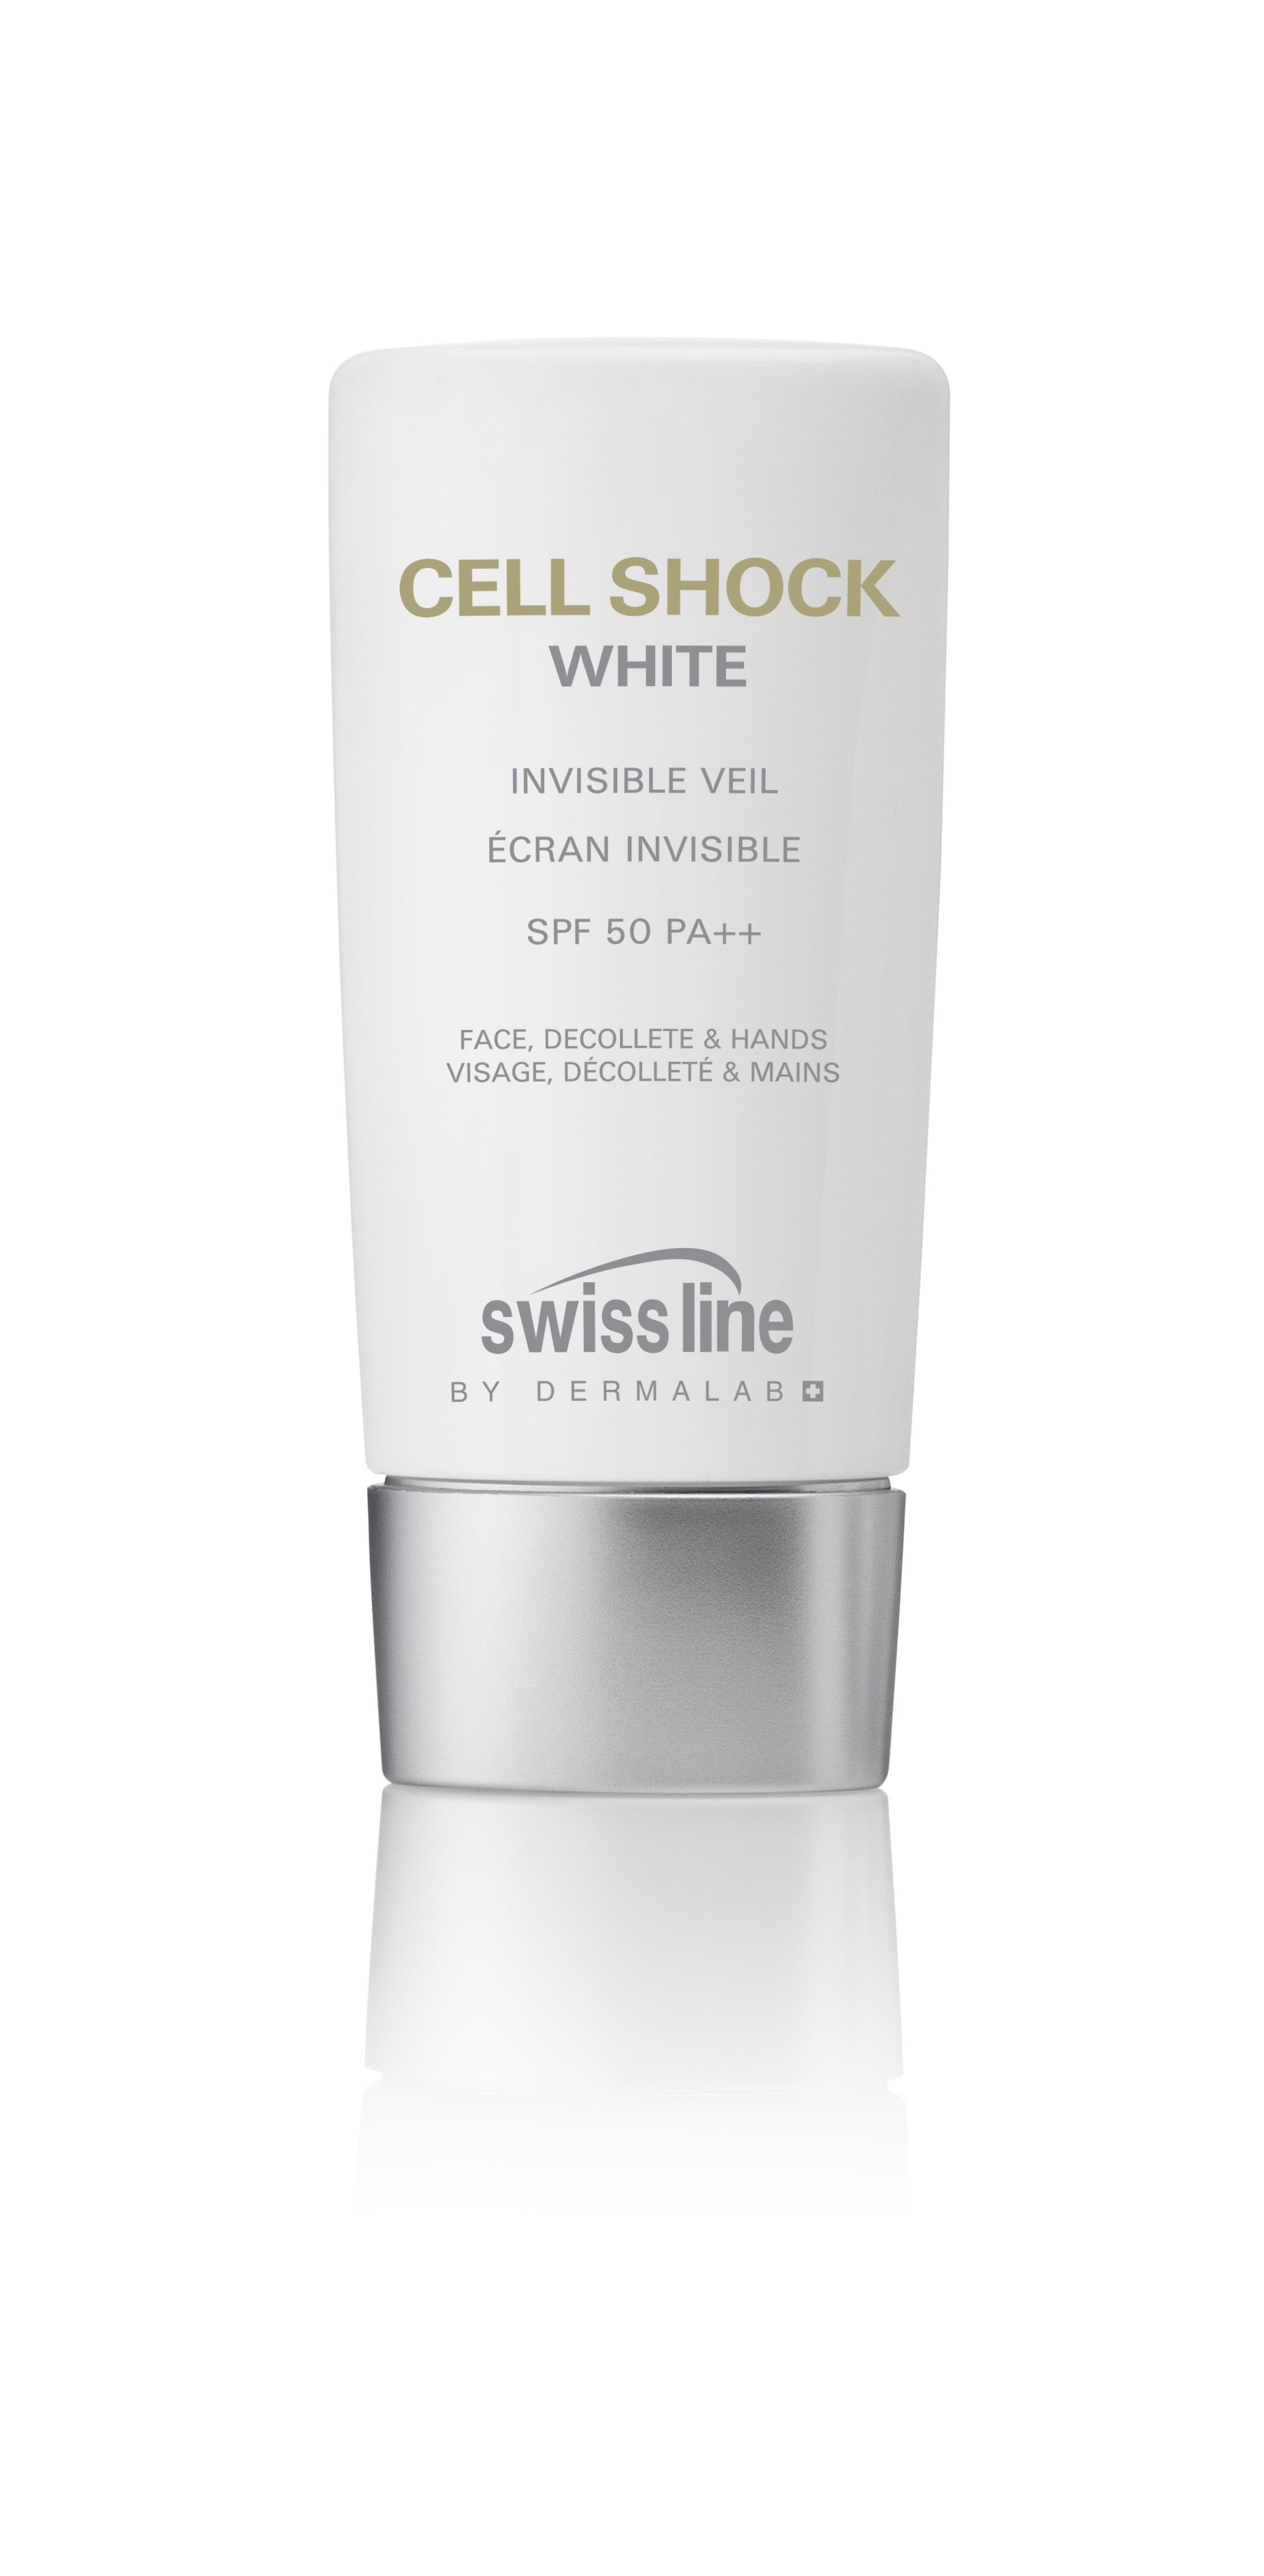 SWISS LINE Вуаль-невидимка SPF 50 / Invisible Veil SPF 50 65 мл -  Особые средства